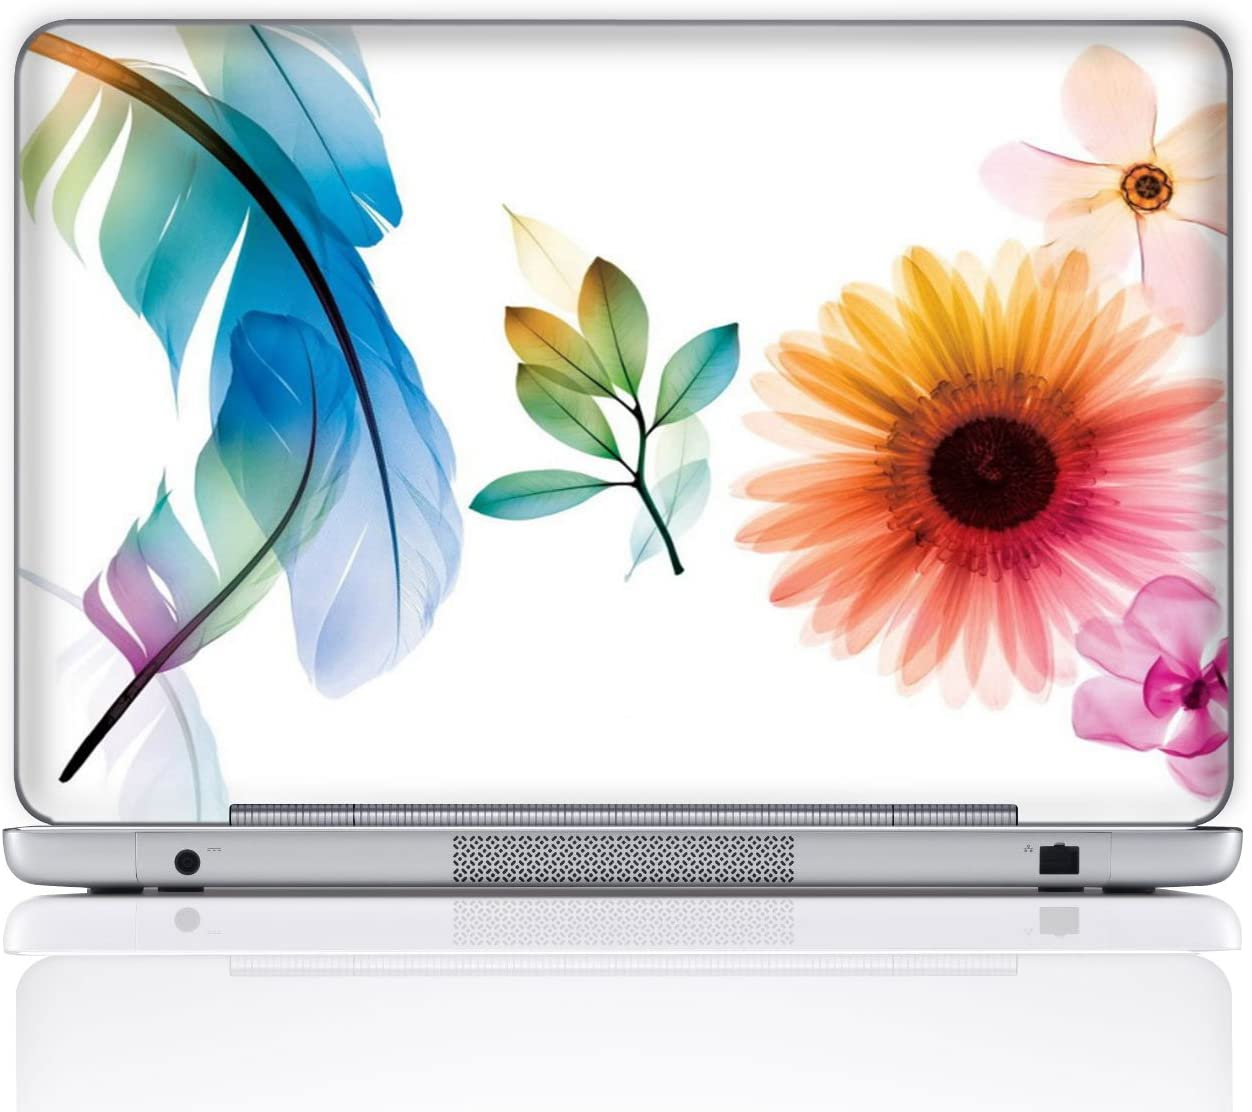 Meffort Inc 14 Inch Laptop Notebook Skin Sticker Cover Art Decal (Free Wrist pad) - Flower Leave Design